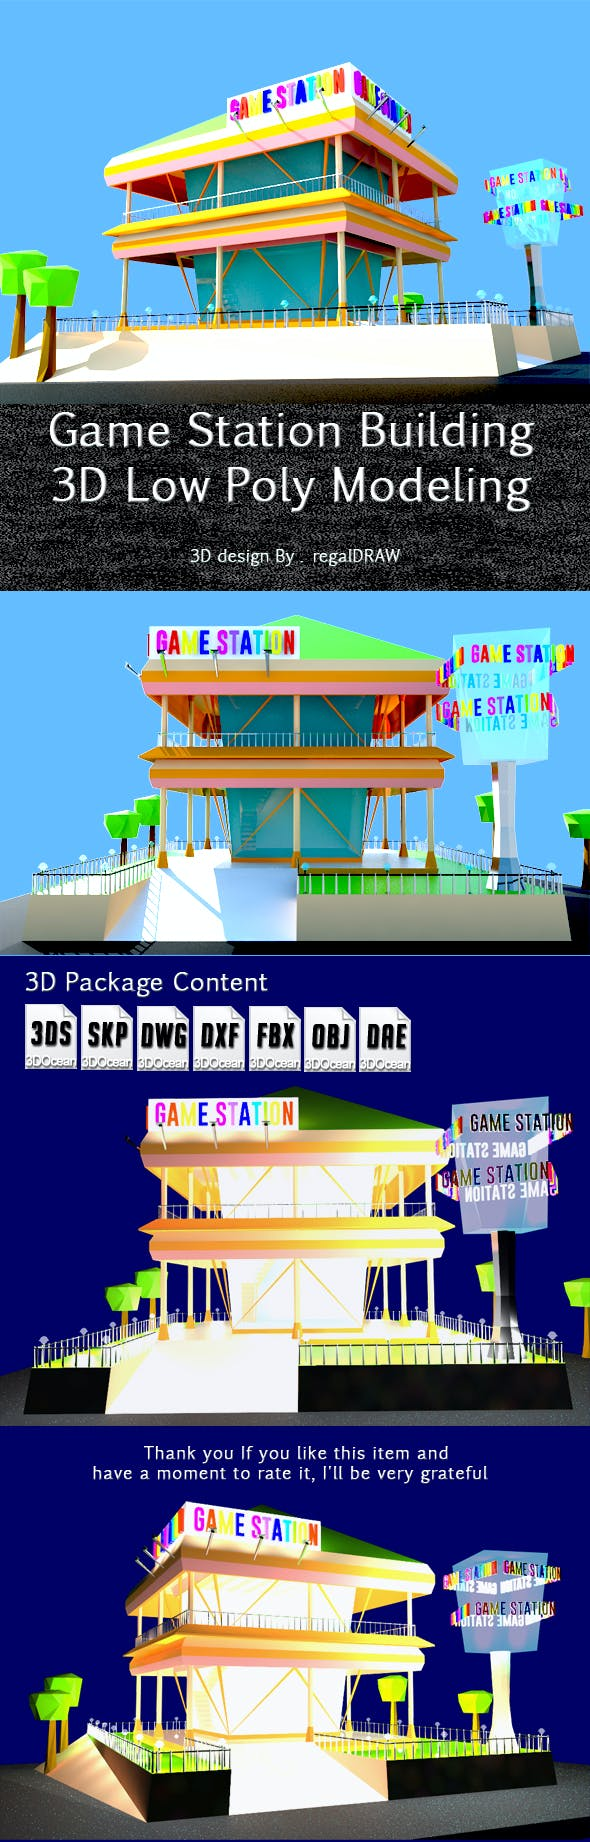 Game Station Building_3D Low Poly Modeling - 3DOcean Item for Sale